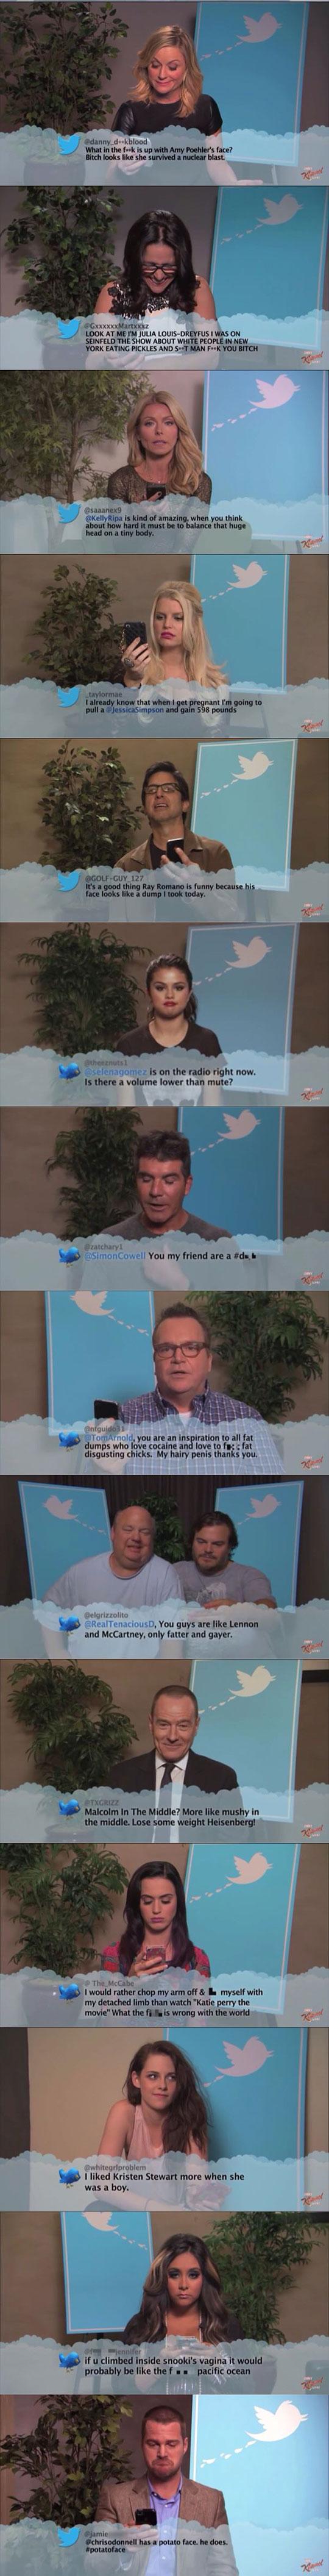 funny-mean-tweets-Twitter-Selena-Gomez